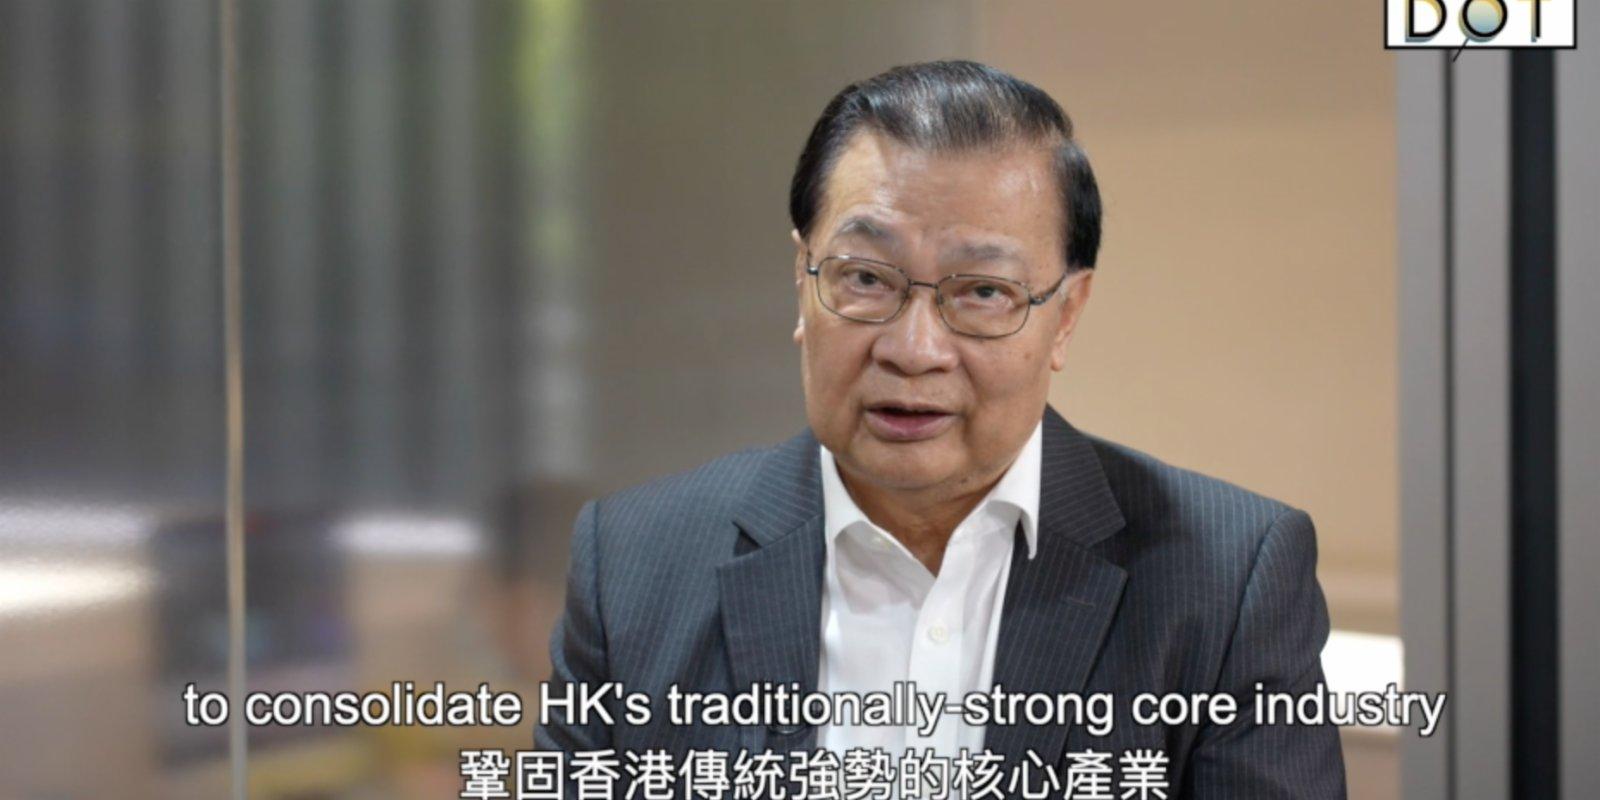 EyE on U 容來熙往 (精華片段) 譚耀宗講保持香港繁榮安定之竅門